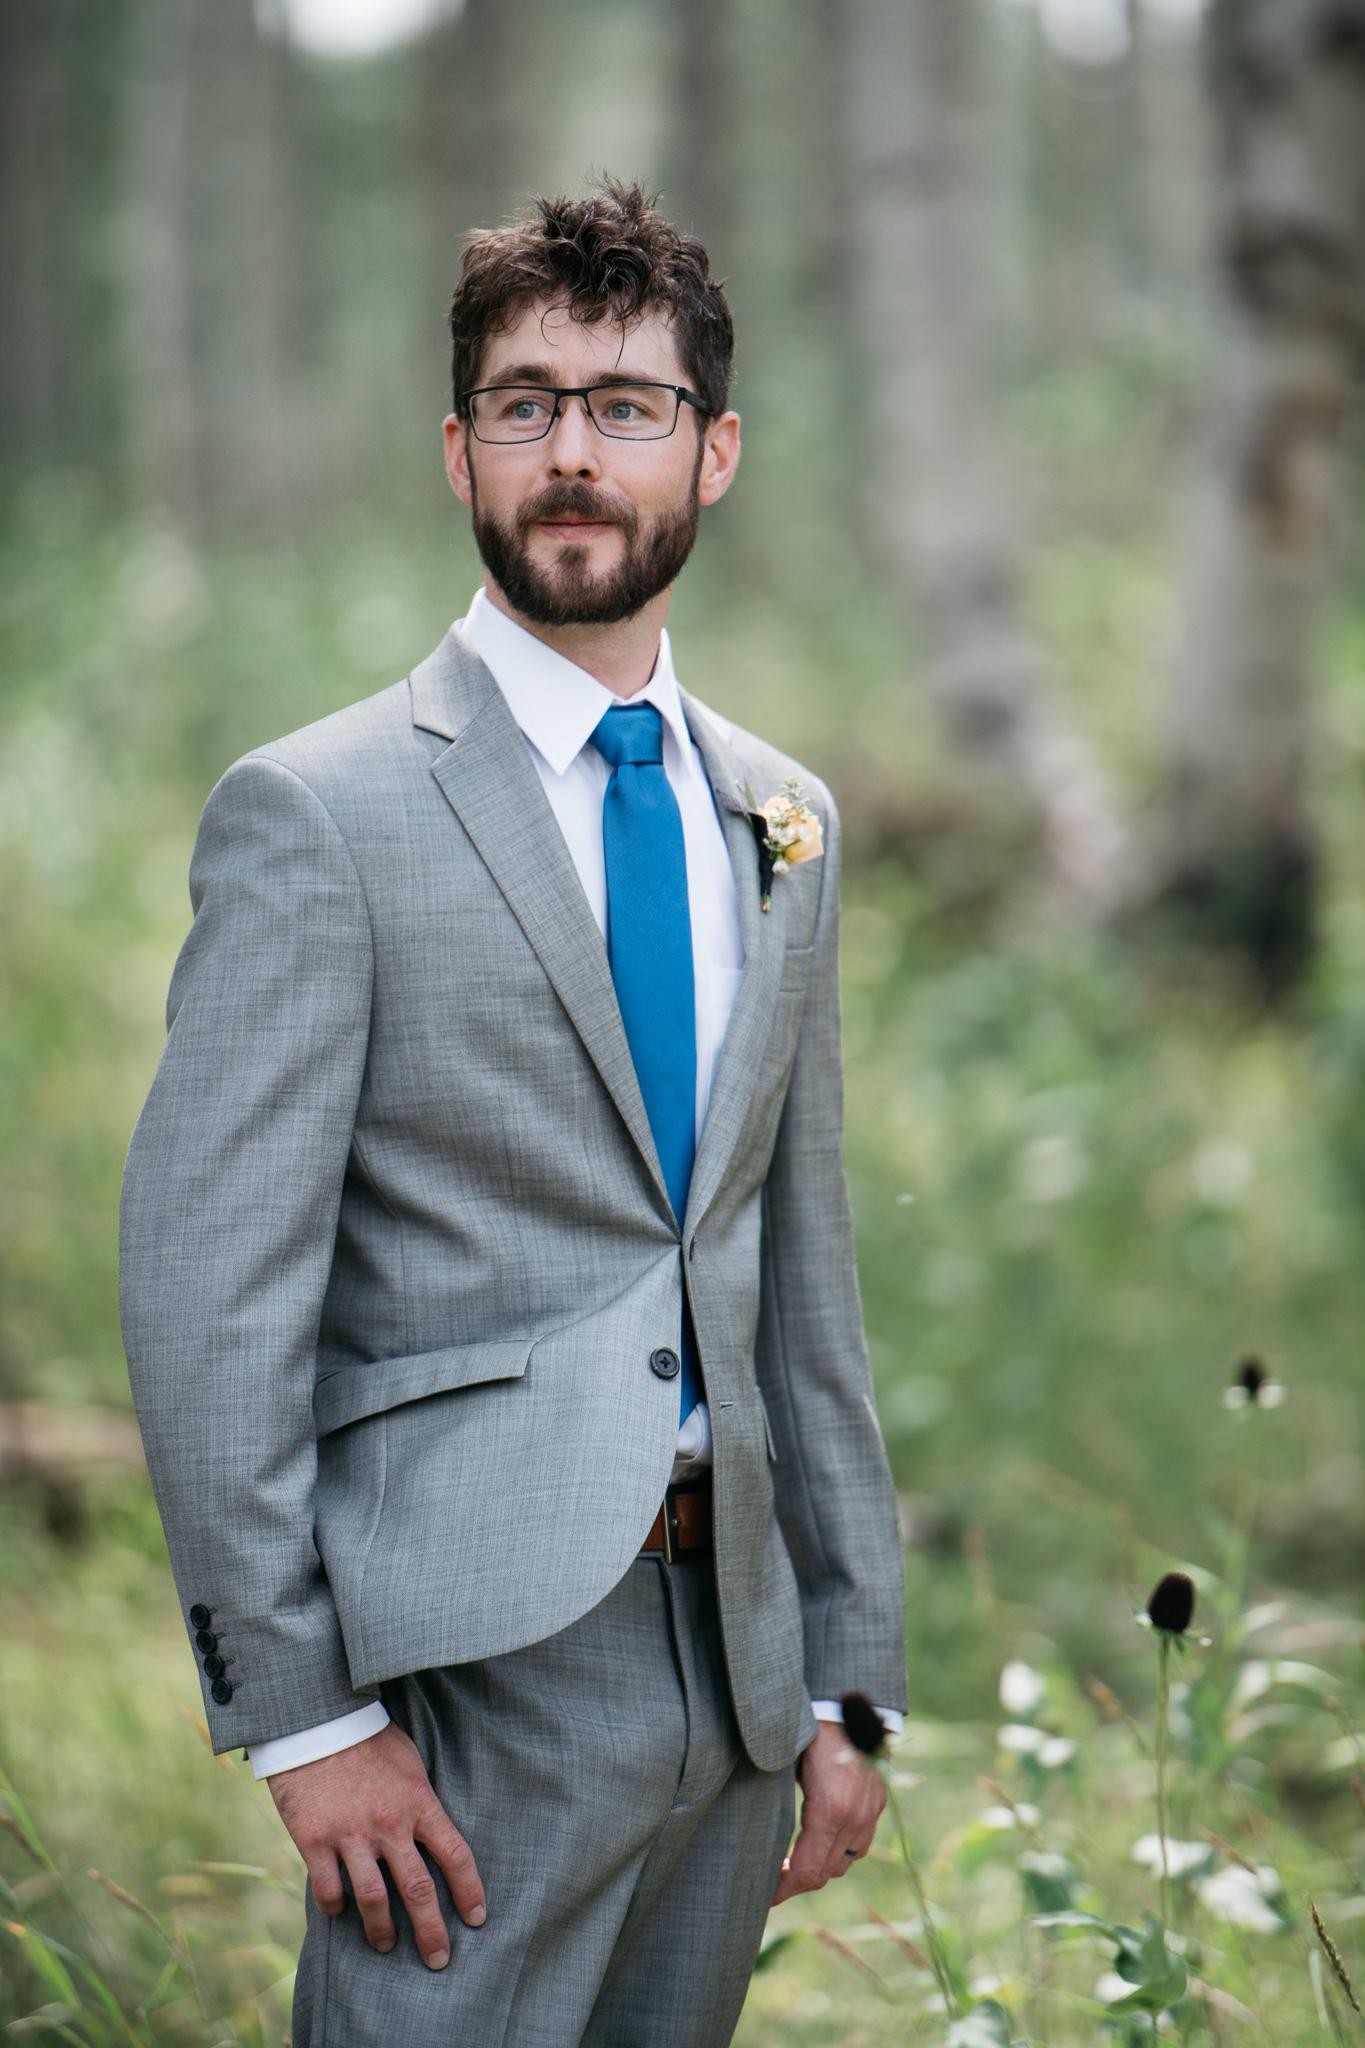 165_ONL_Kat_Nick_Wedding_Trevor_Hooper_Photo.jpg